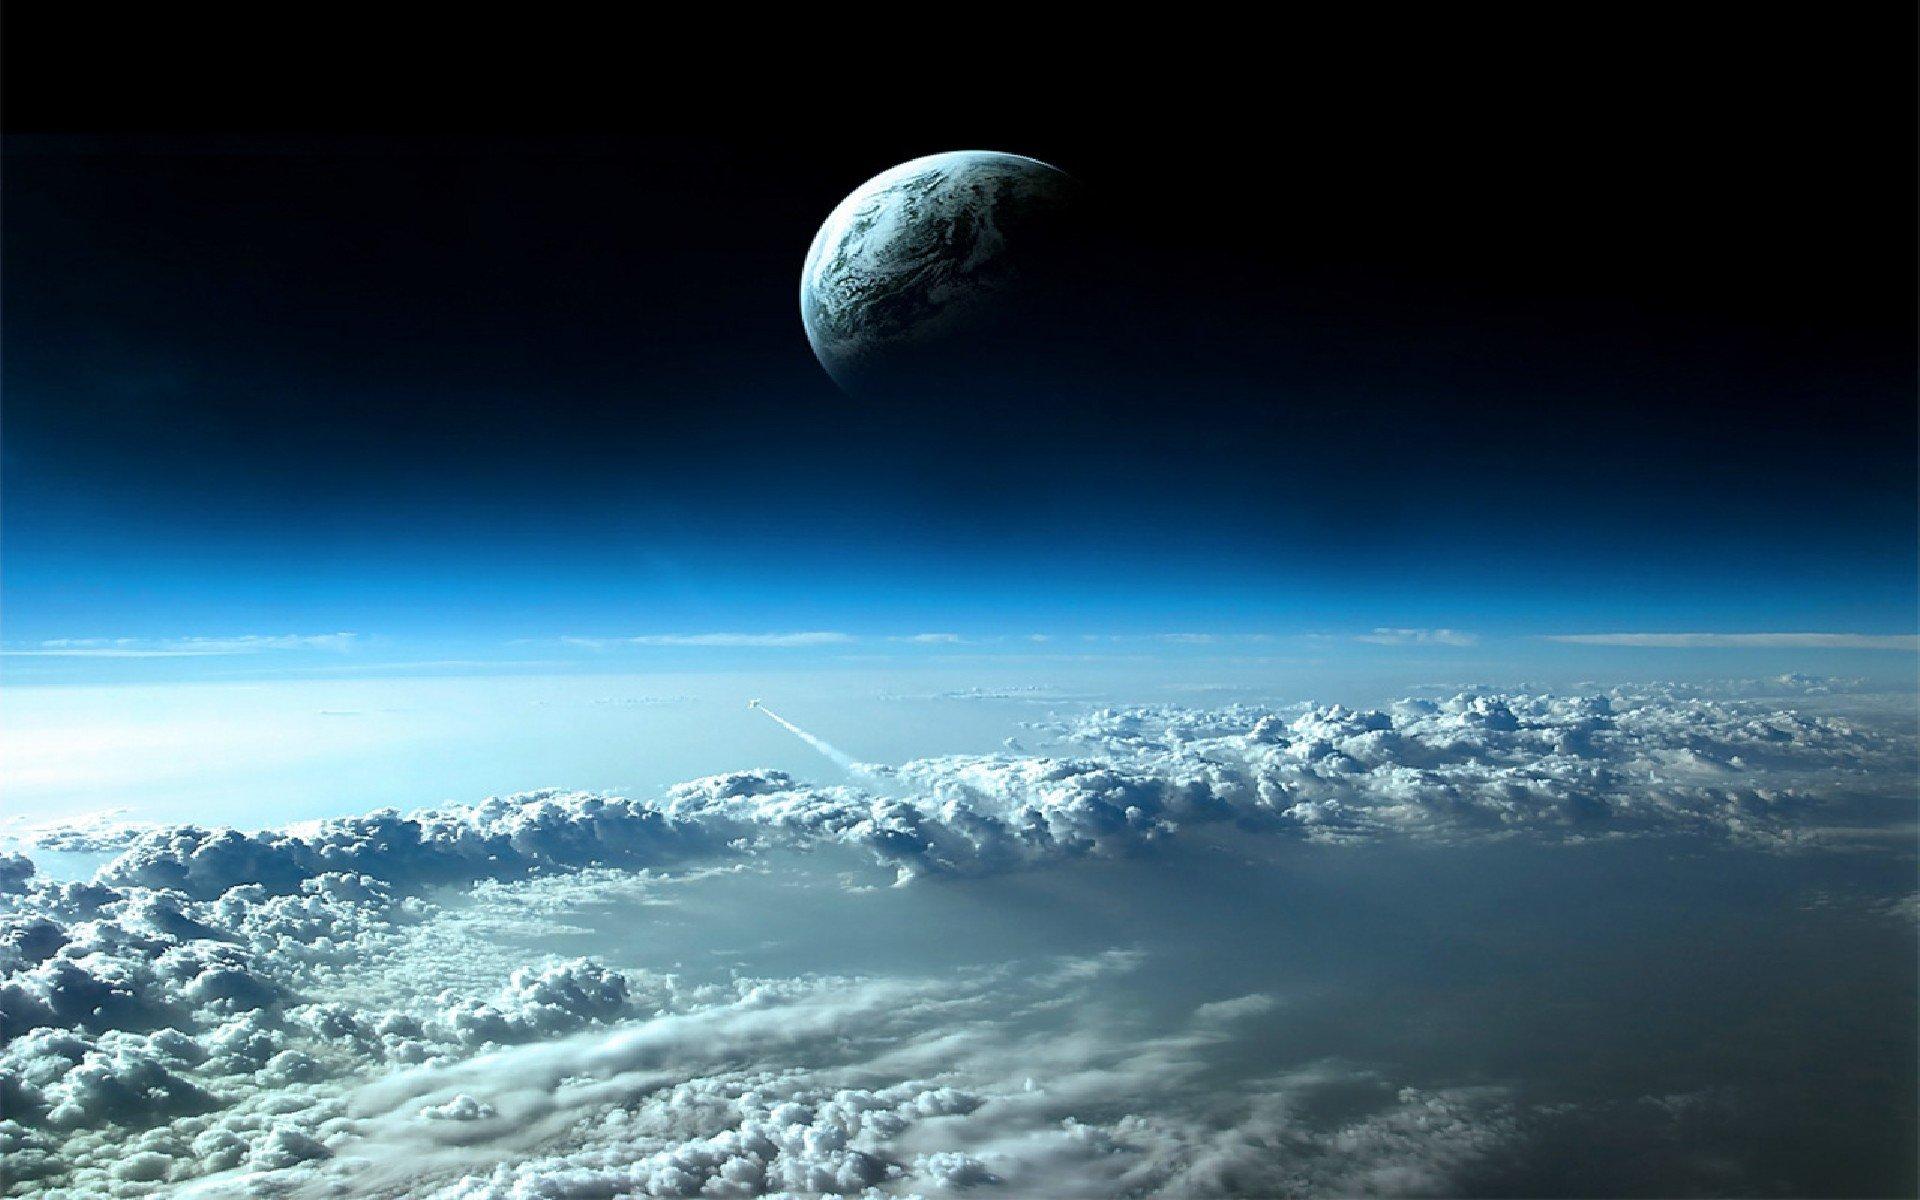 Real Space Wallpaper Hd Widescreen Space Wallpaper HD Wid...